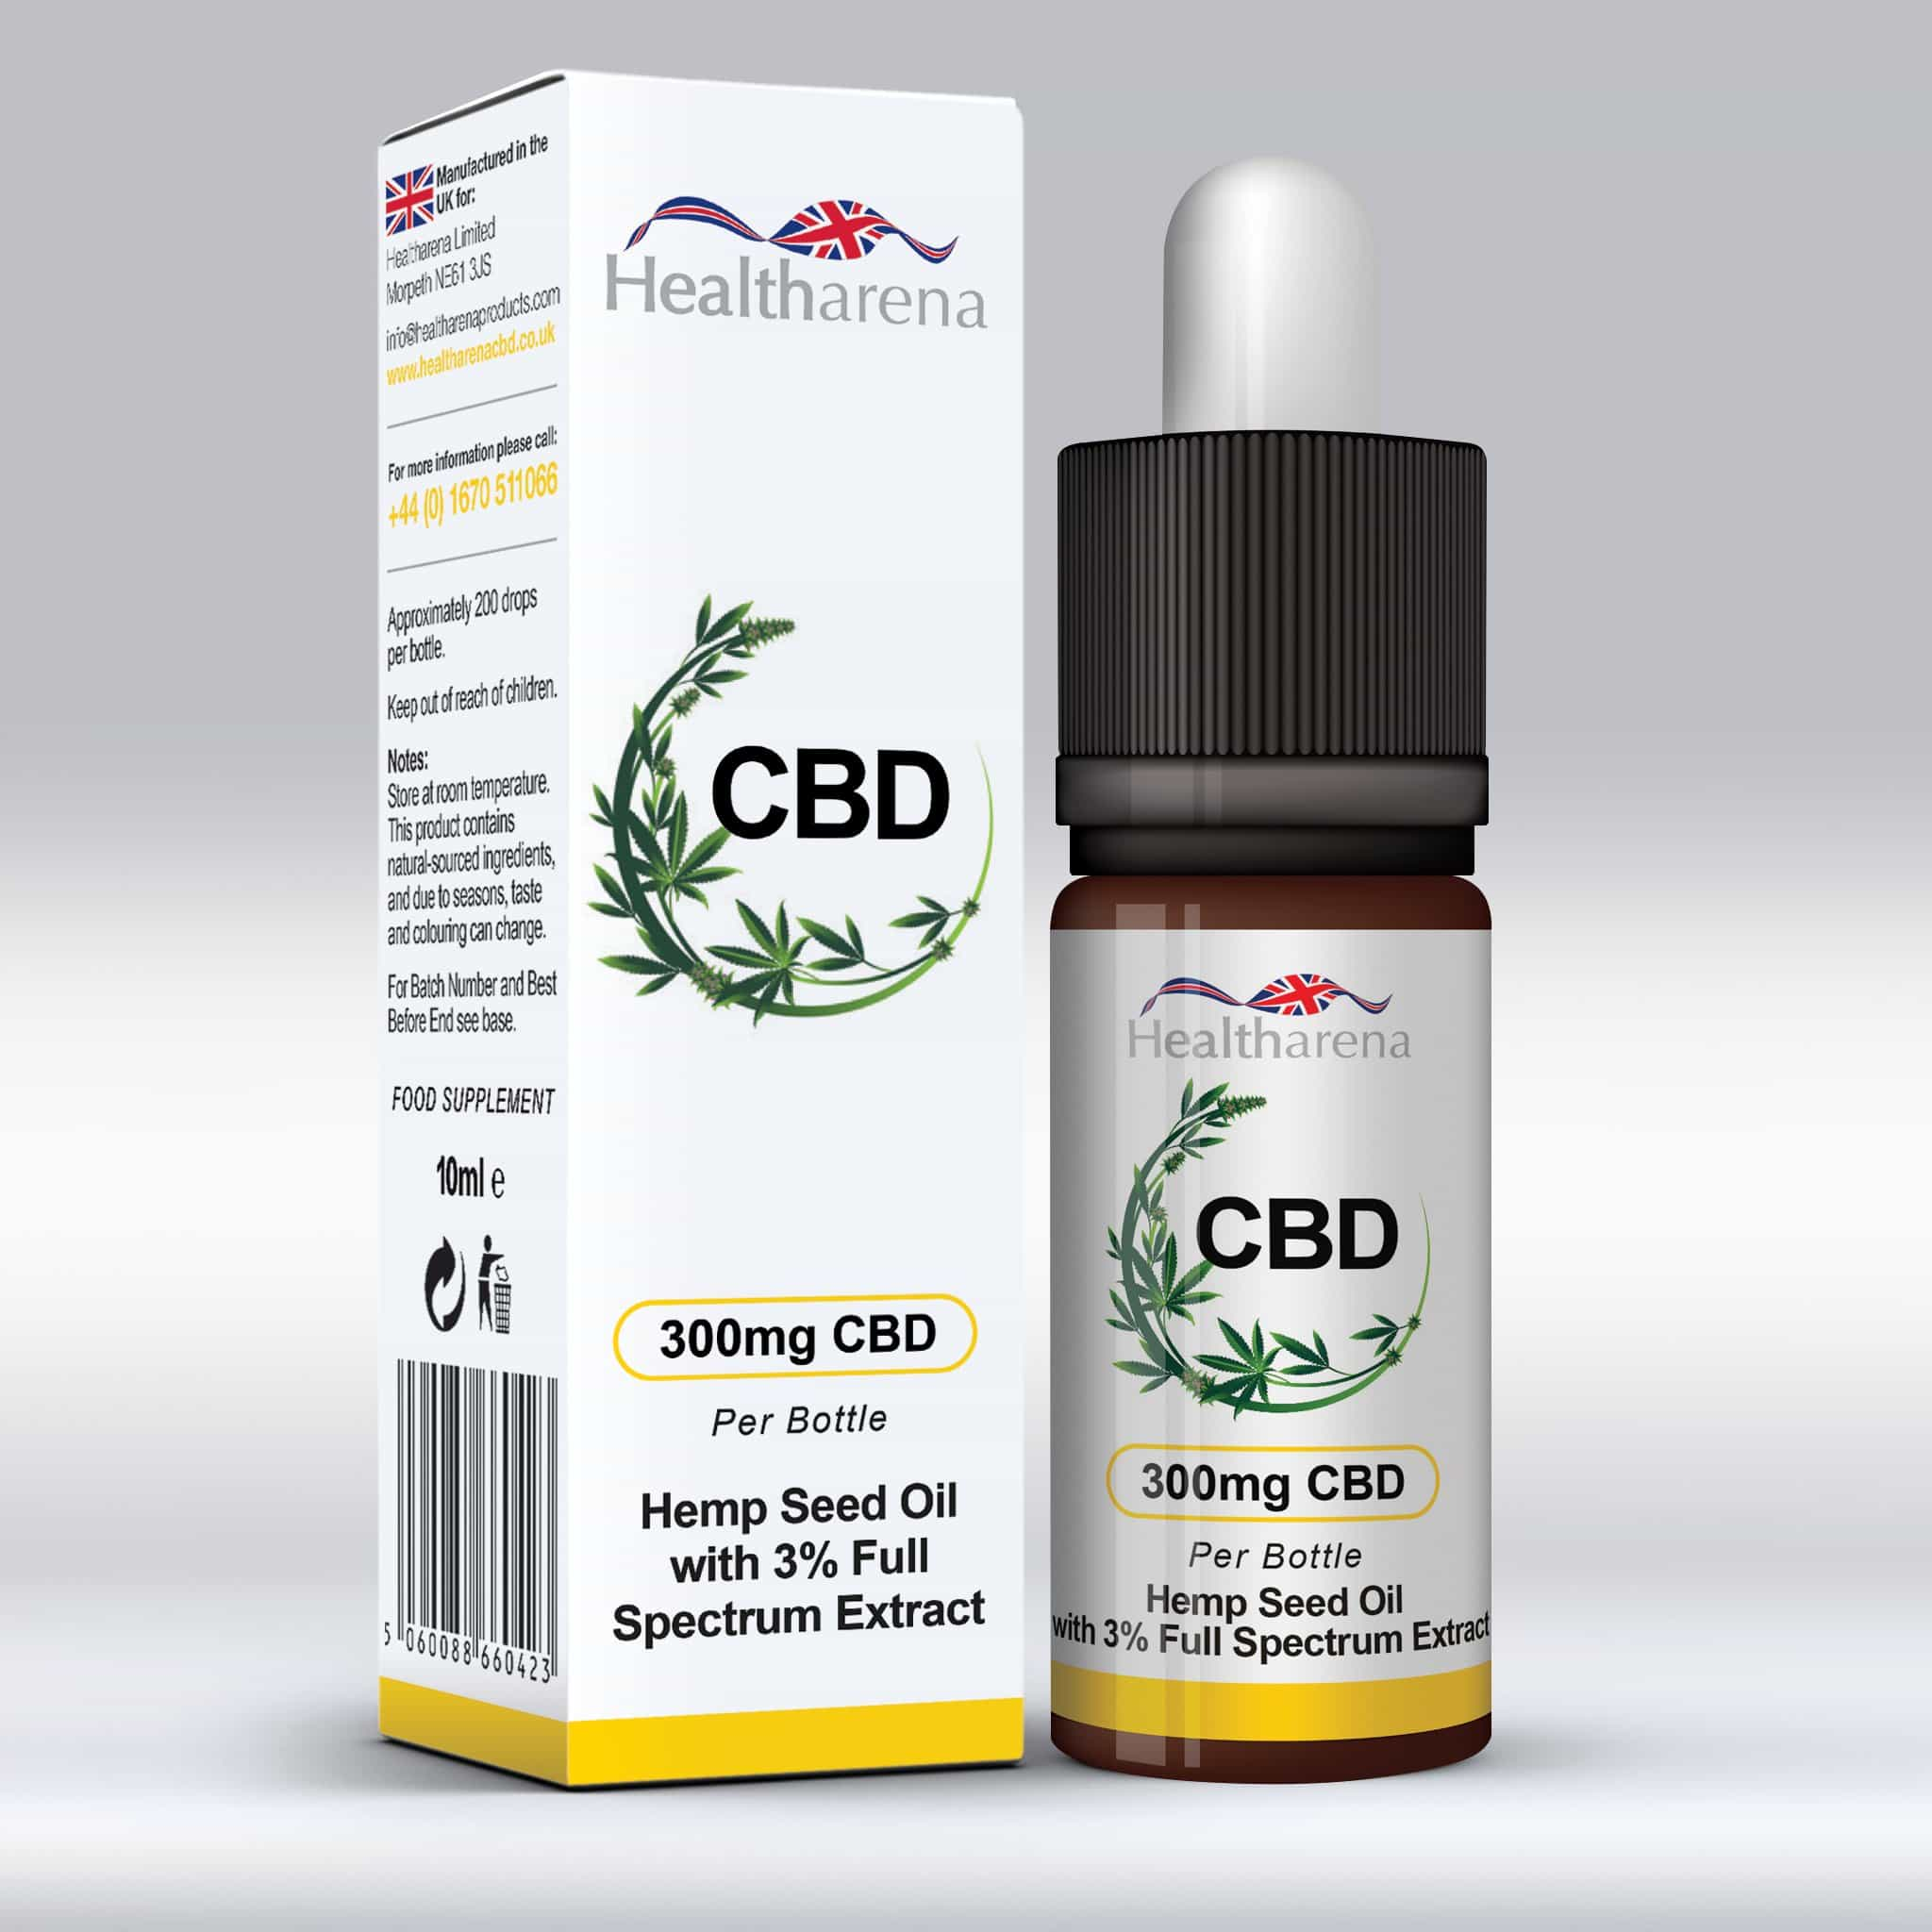 Healtharena CBD Oil 300mg